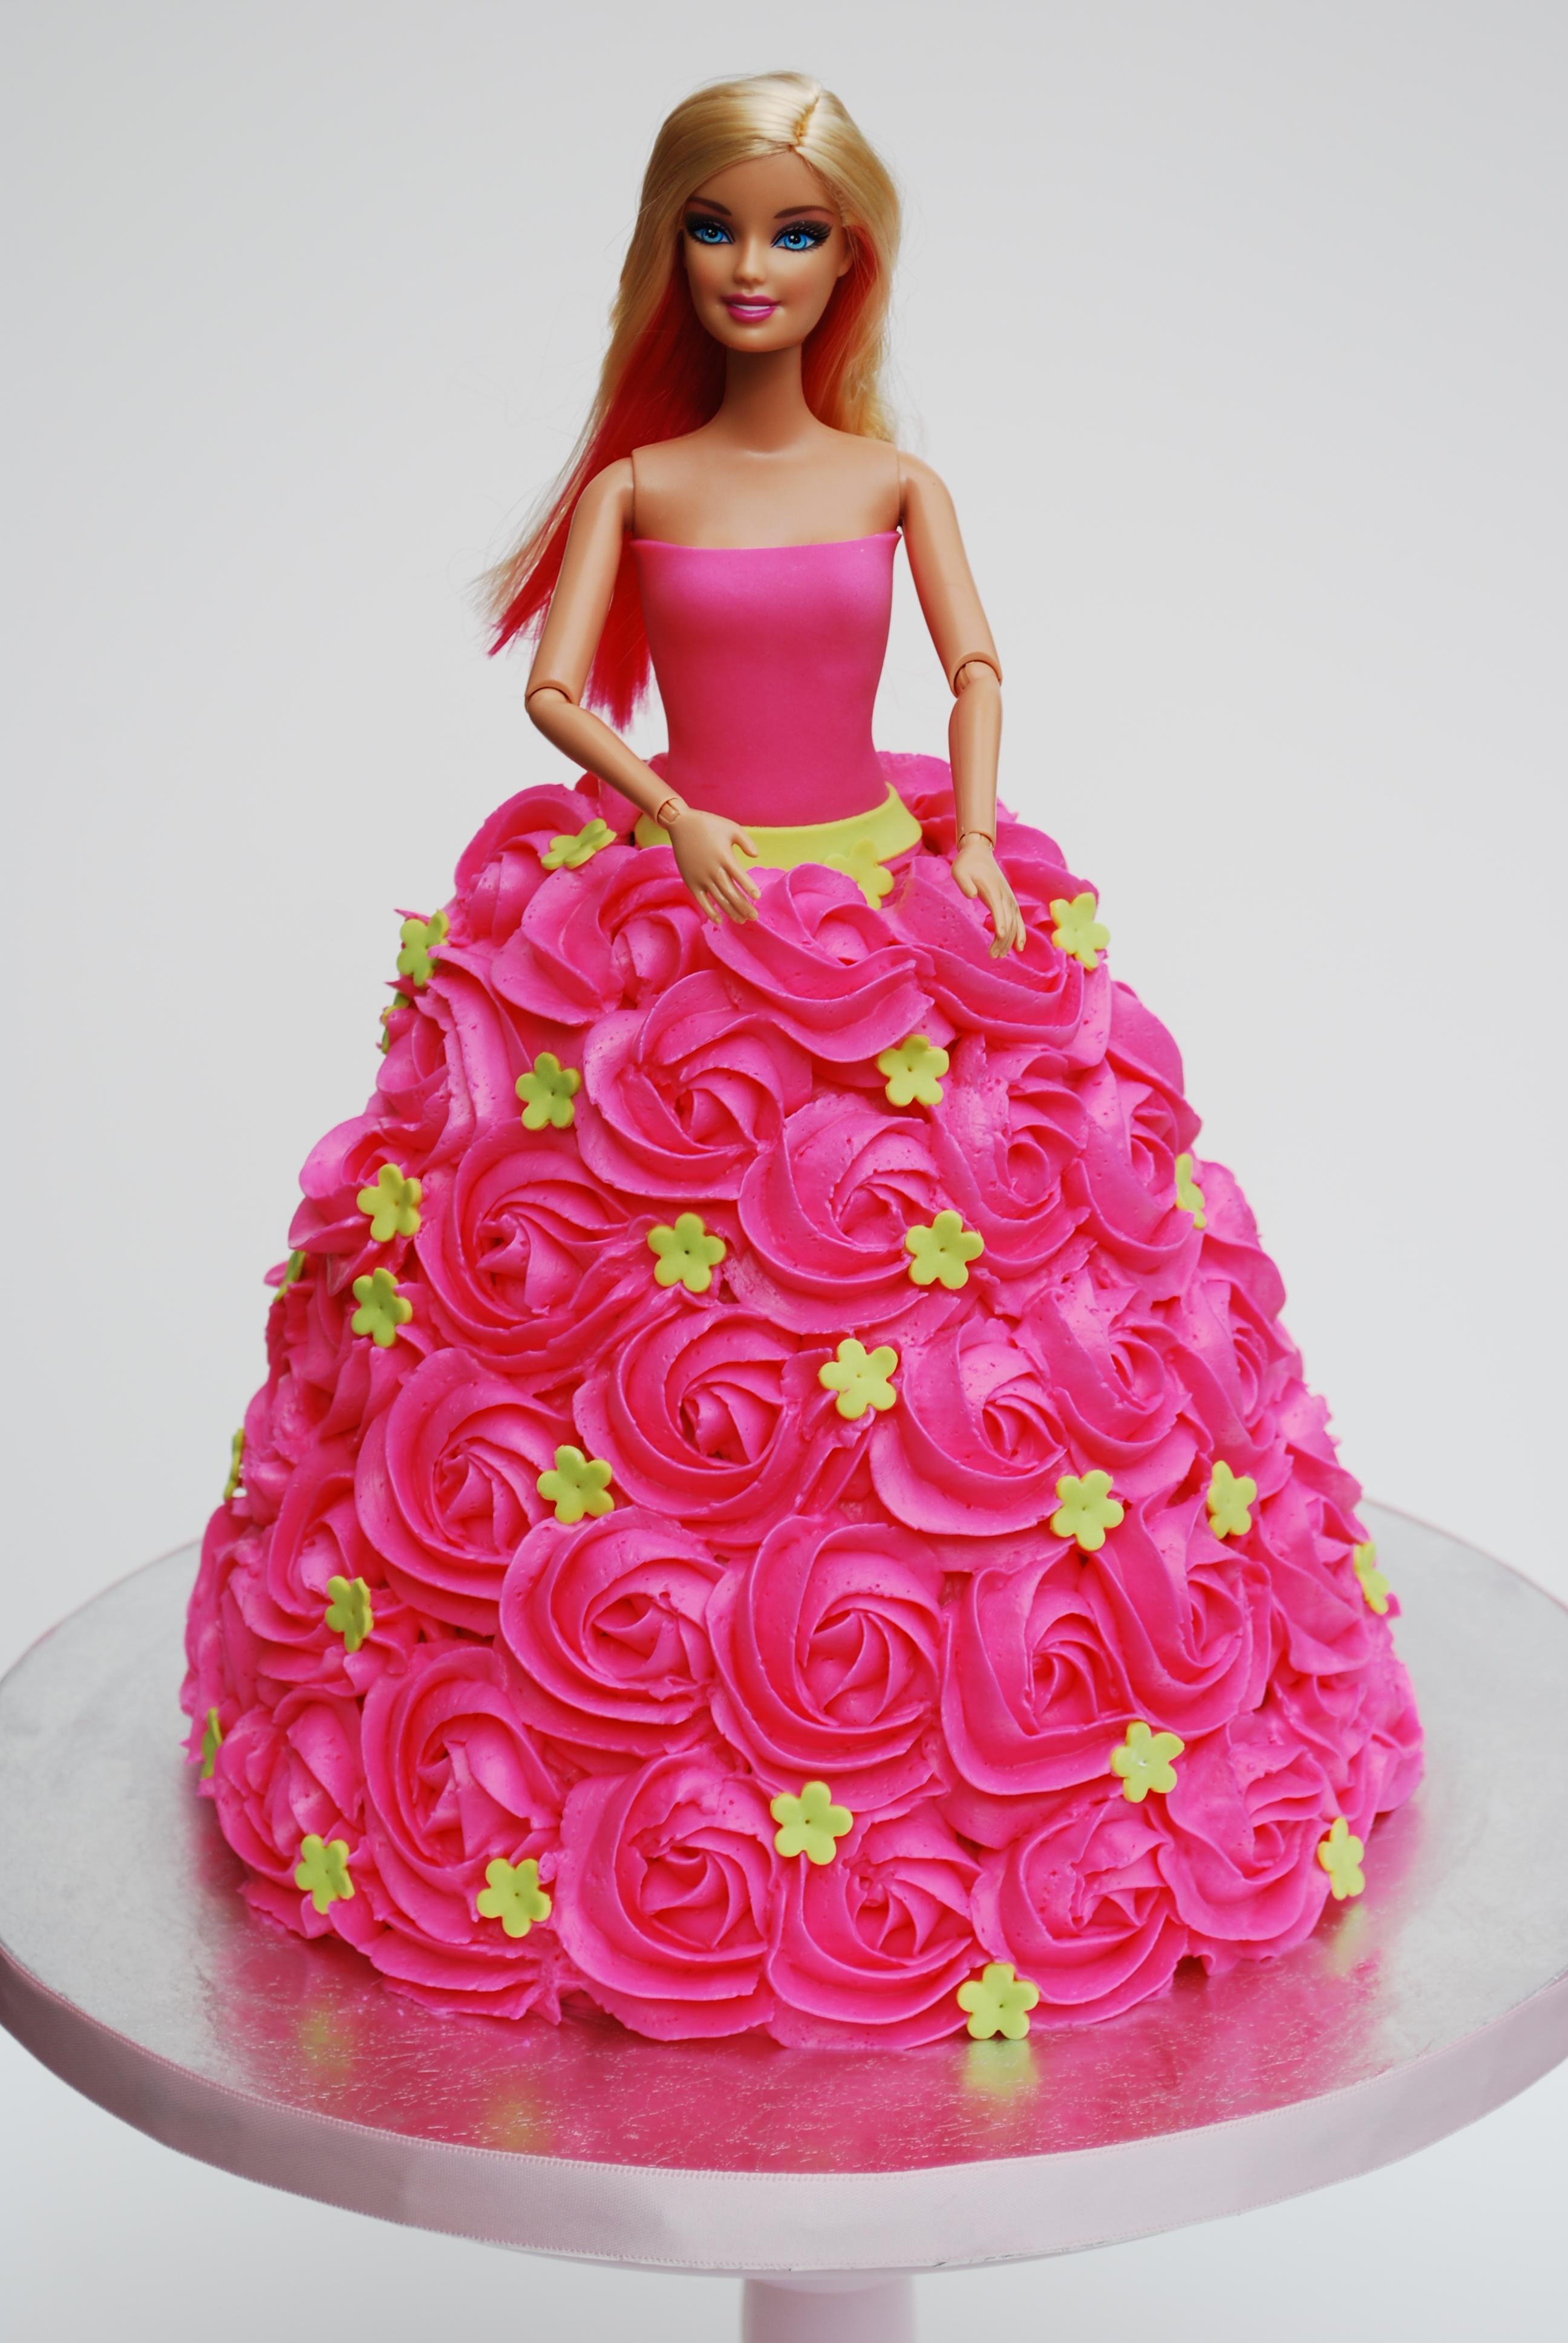 Pink Rosette Barbie Cake sweetworldofcakes